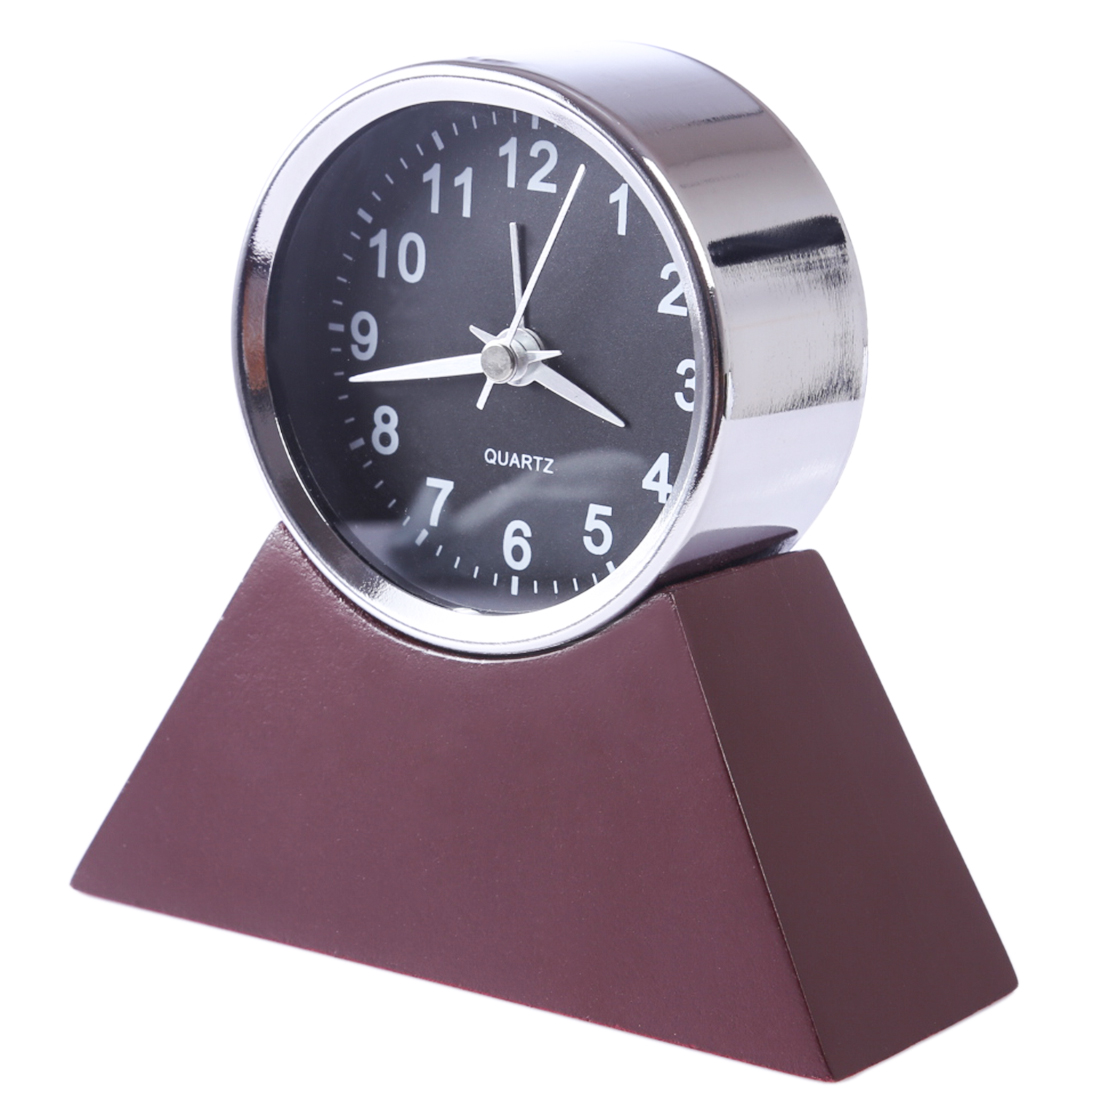 Home Decor For Sale: Homingdeco Hot Sale 10cm Simple Alarm Clock Wooden For